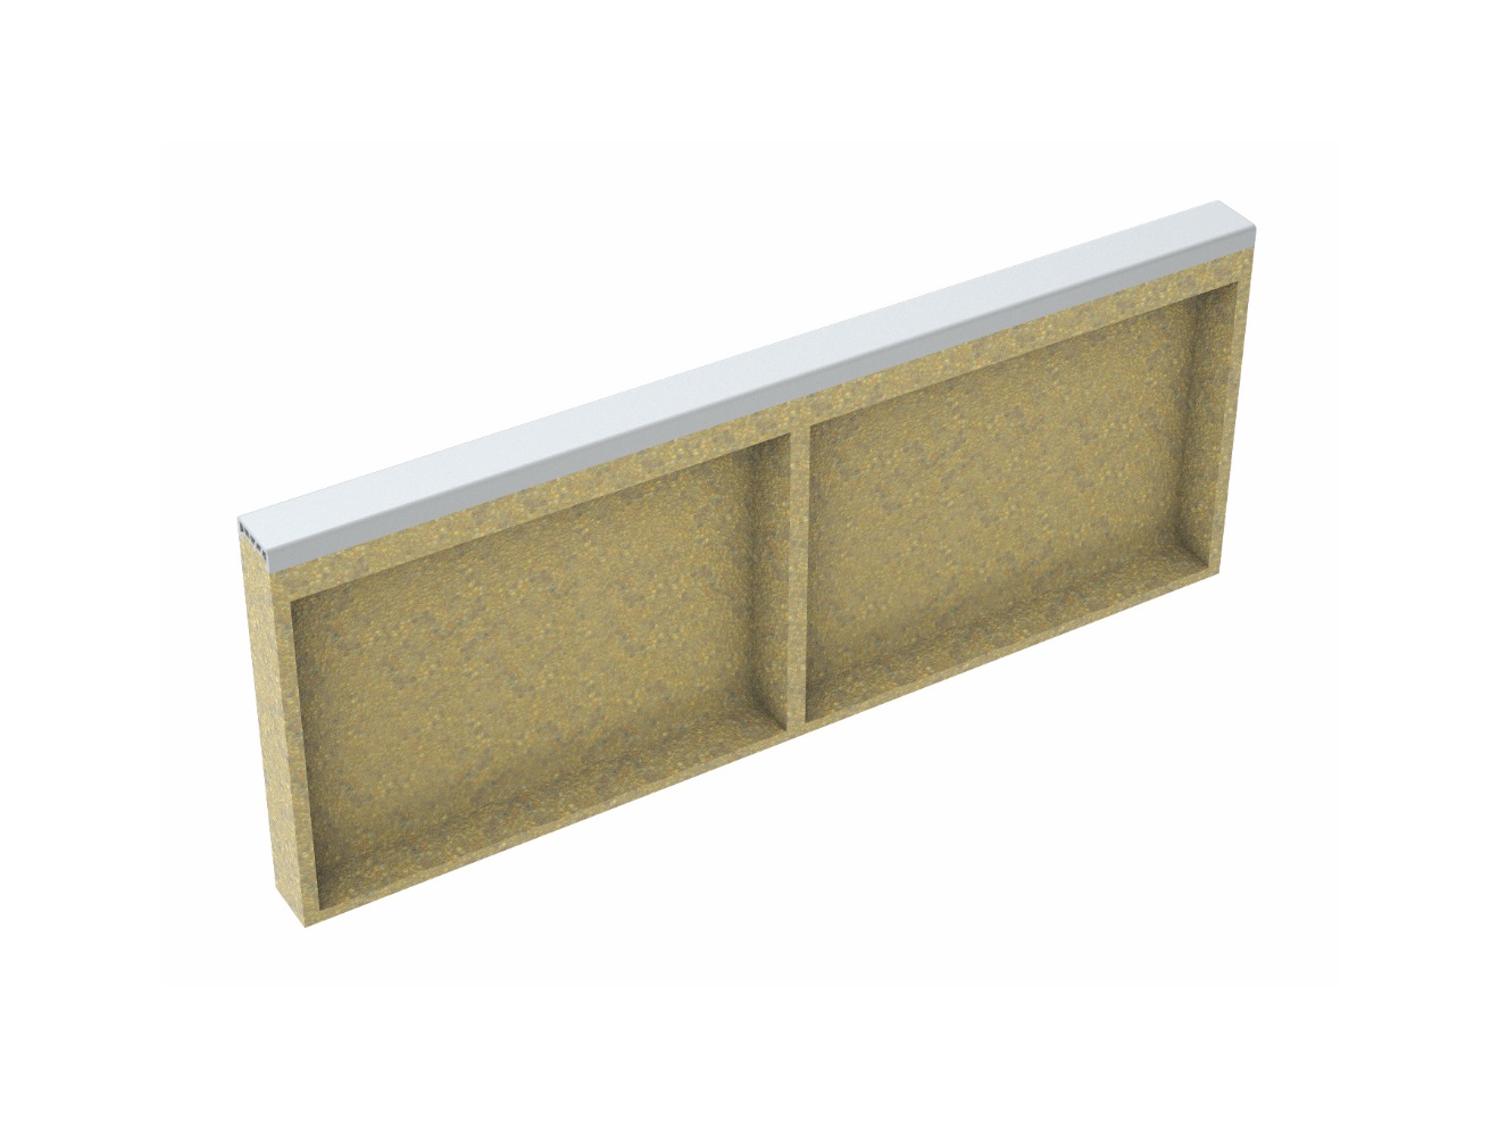 Soft curb made of polymer concrete white